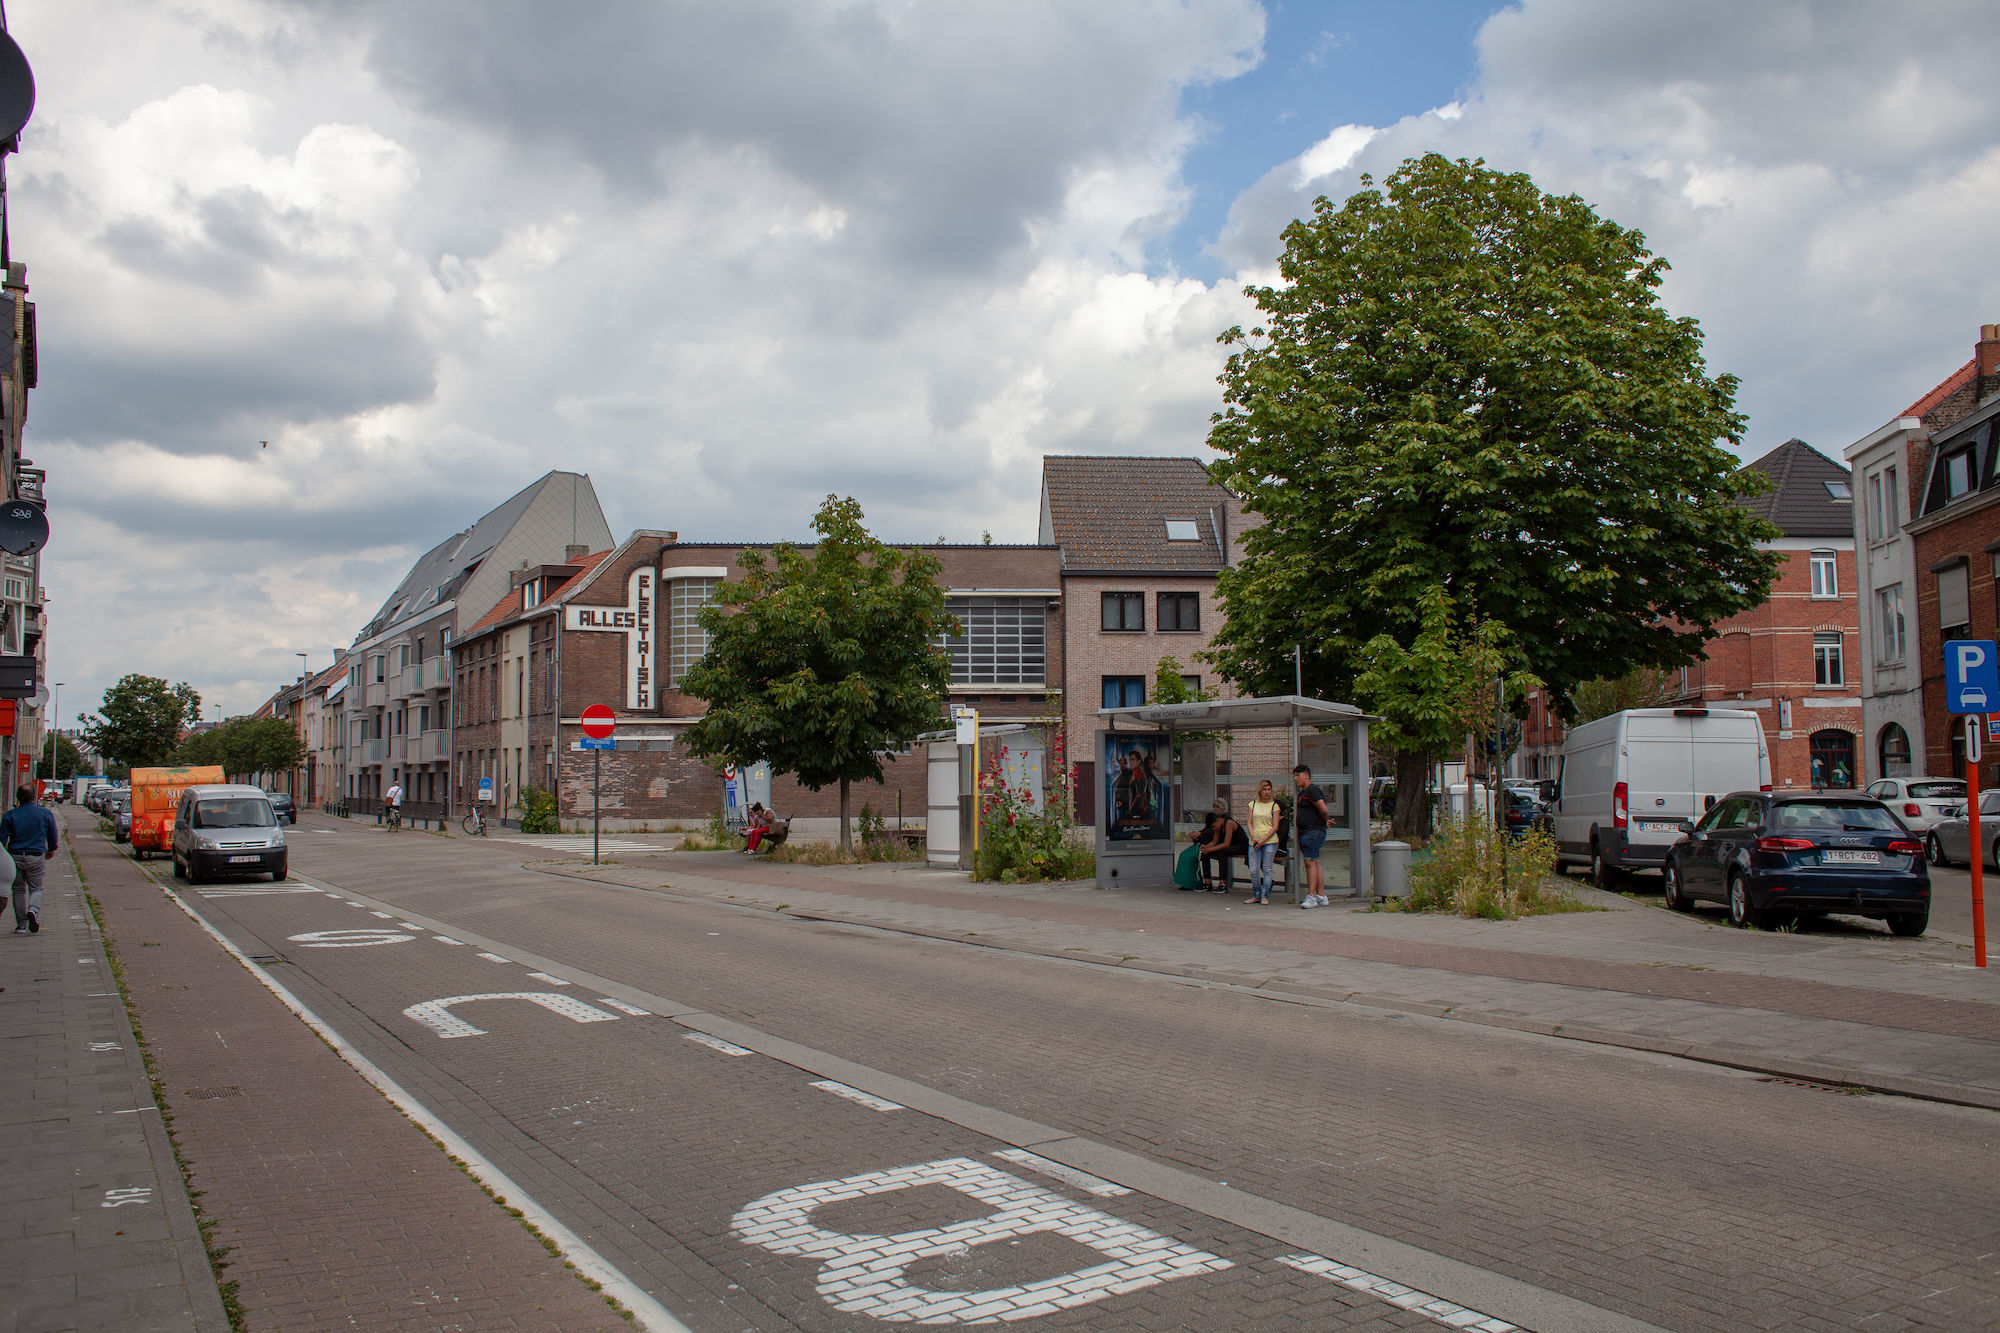 2019-07-02 Muide Meulestede prospectie Wannes_stadsvernieuwing_IMG_0311-3.jpg